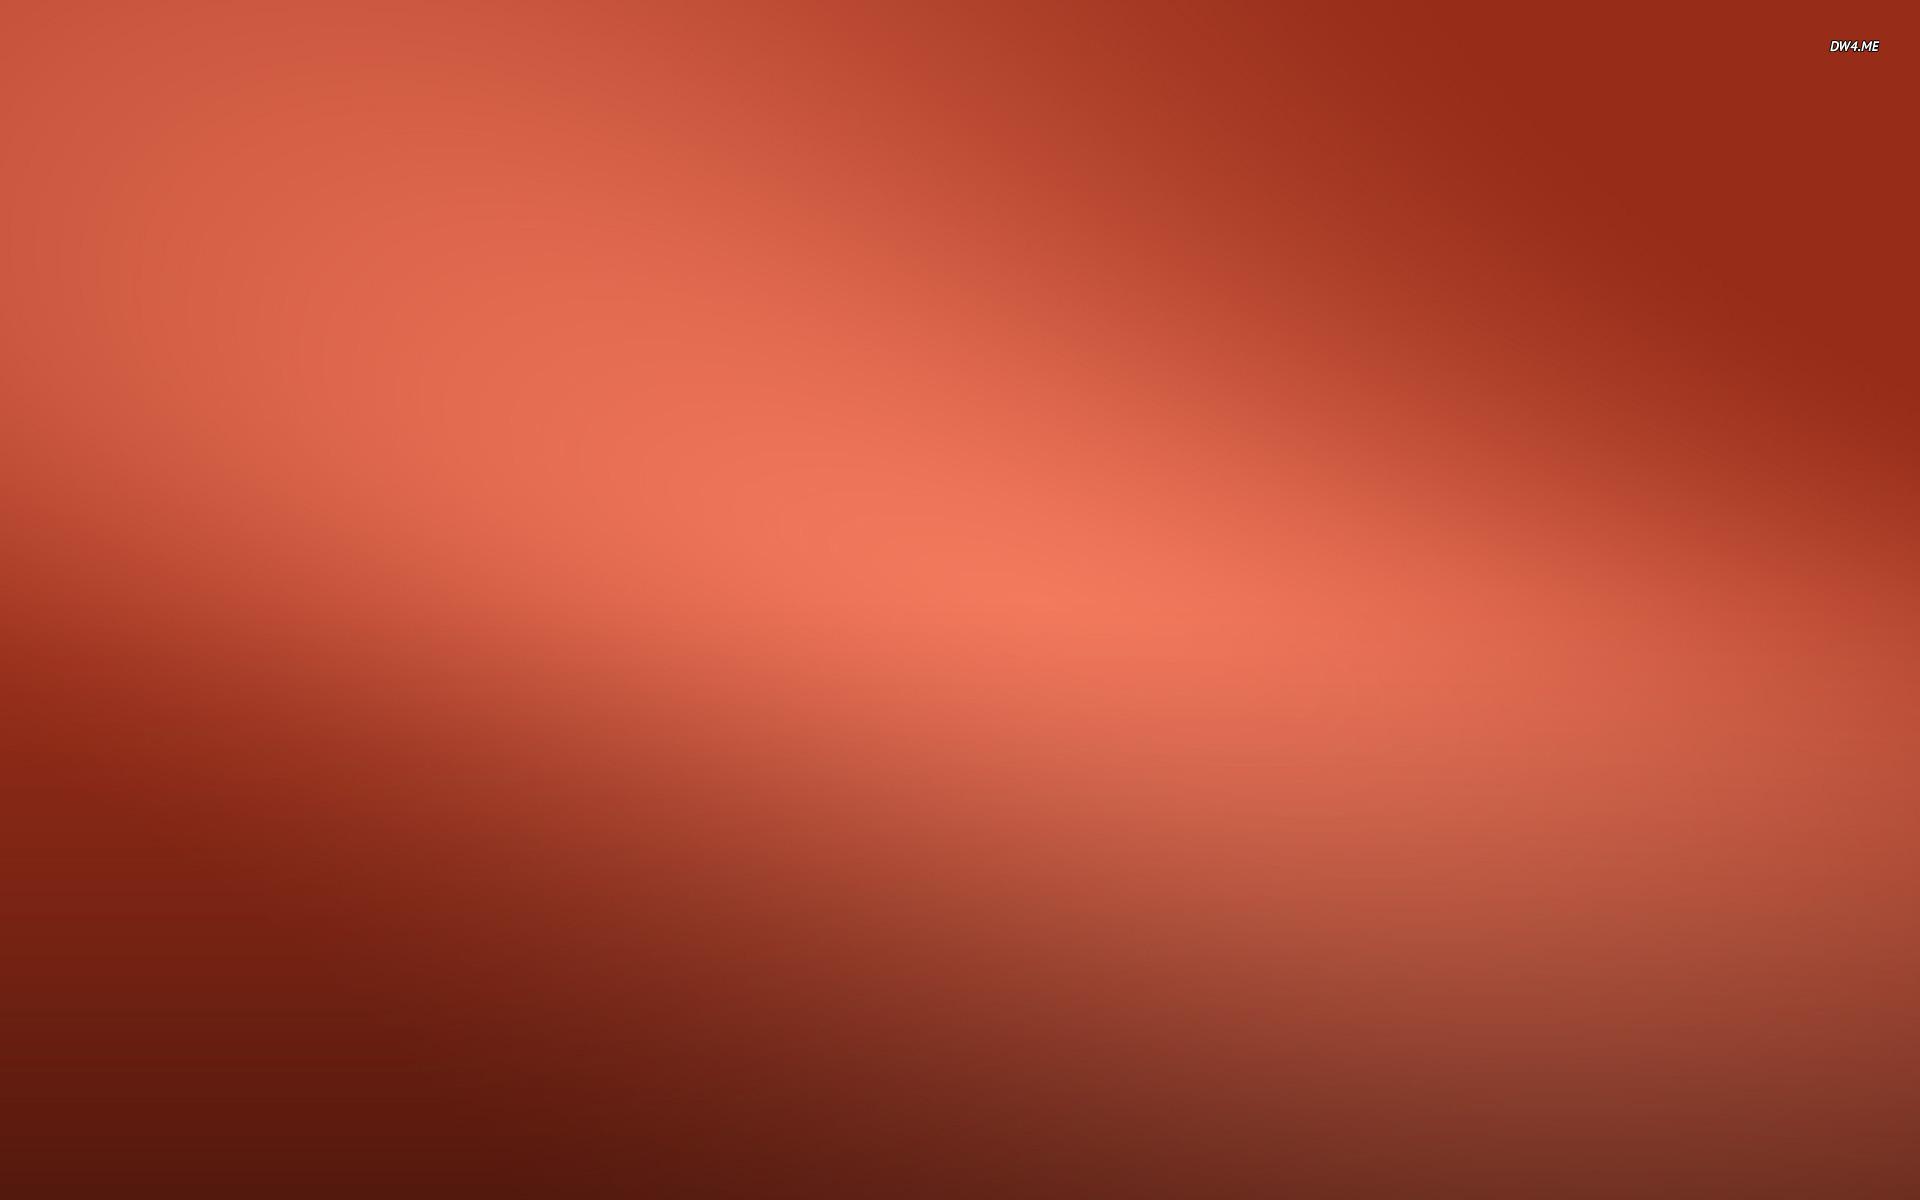 Copper Background Copper wallpaper 1920x1200 1920x1200